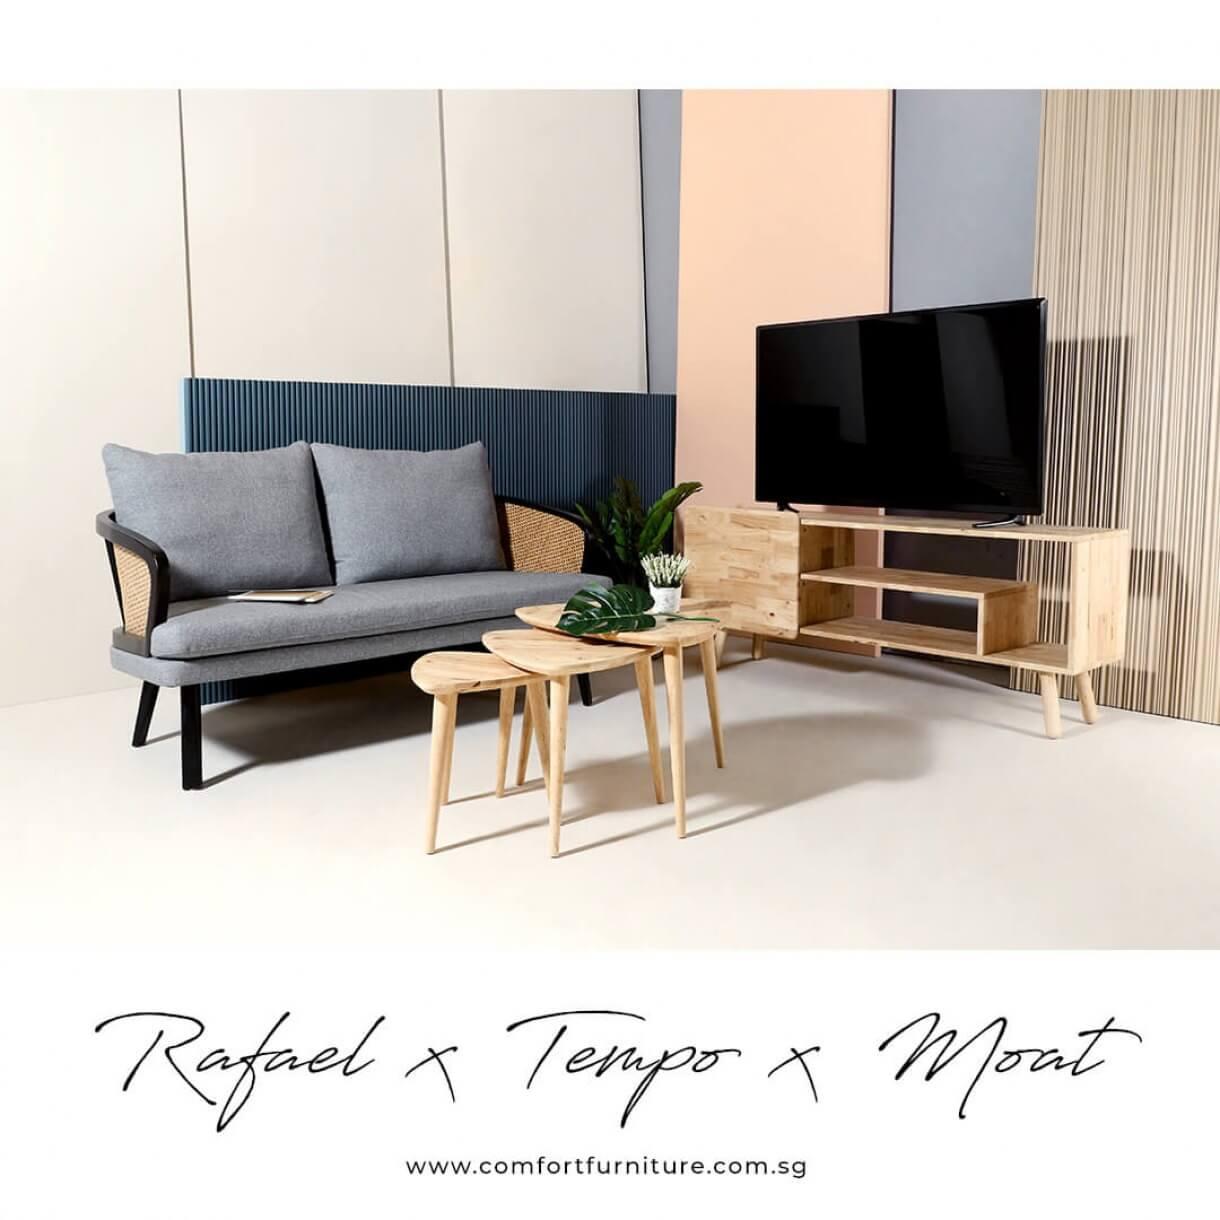 Retro Inspired Living Room with Rafael Rattan Sofa - Comfort Furniture